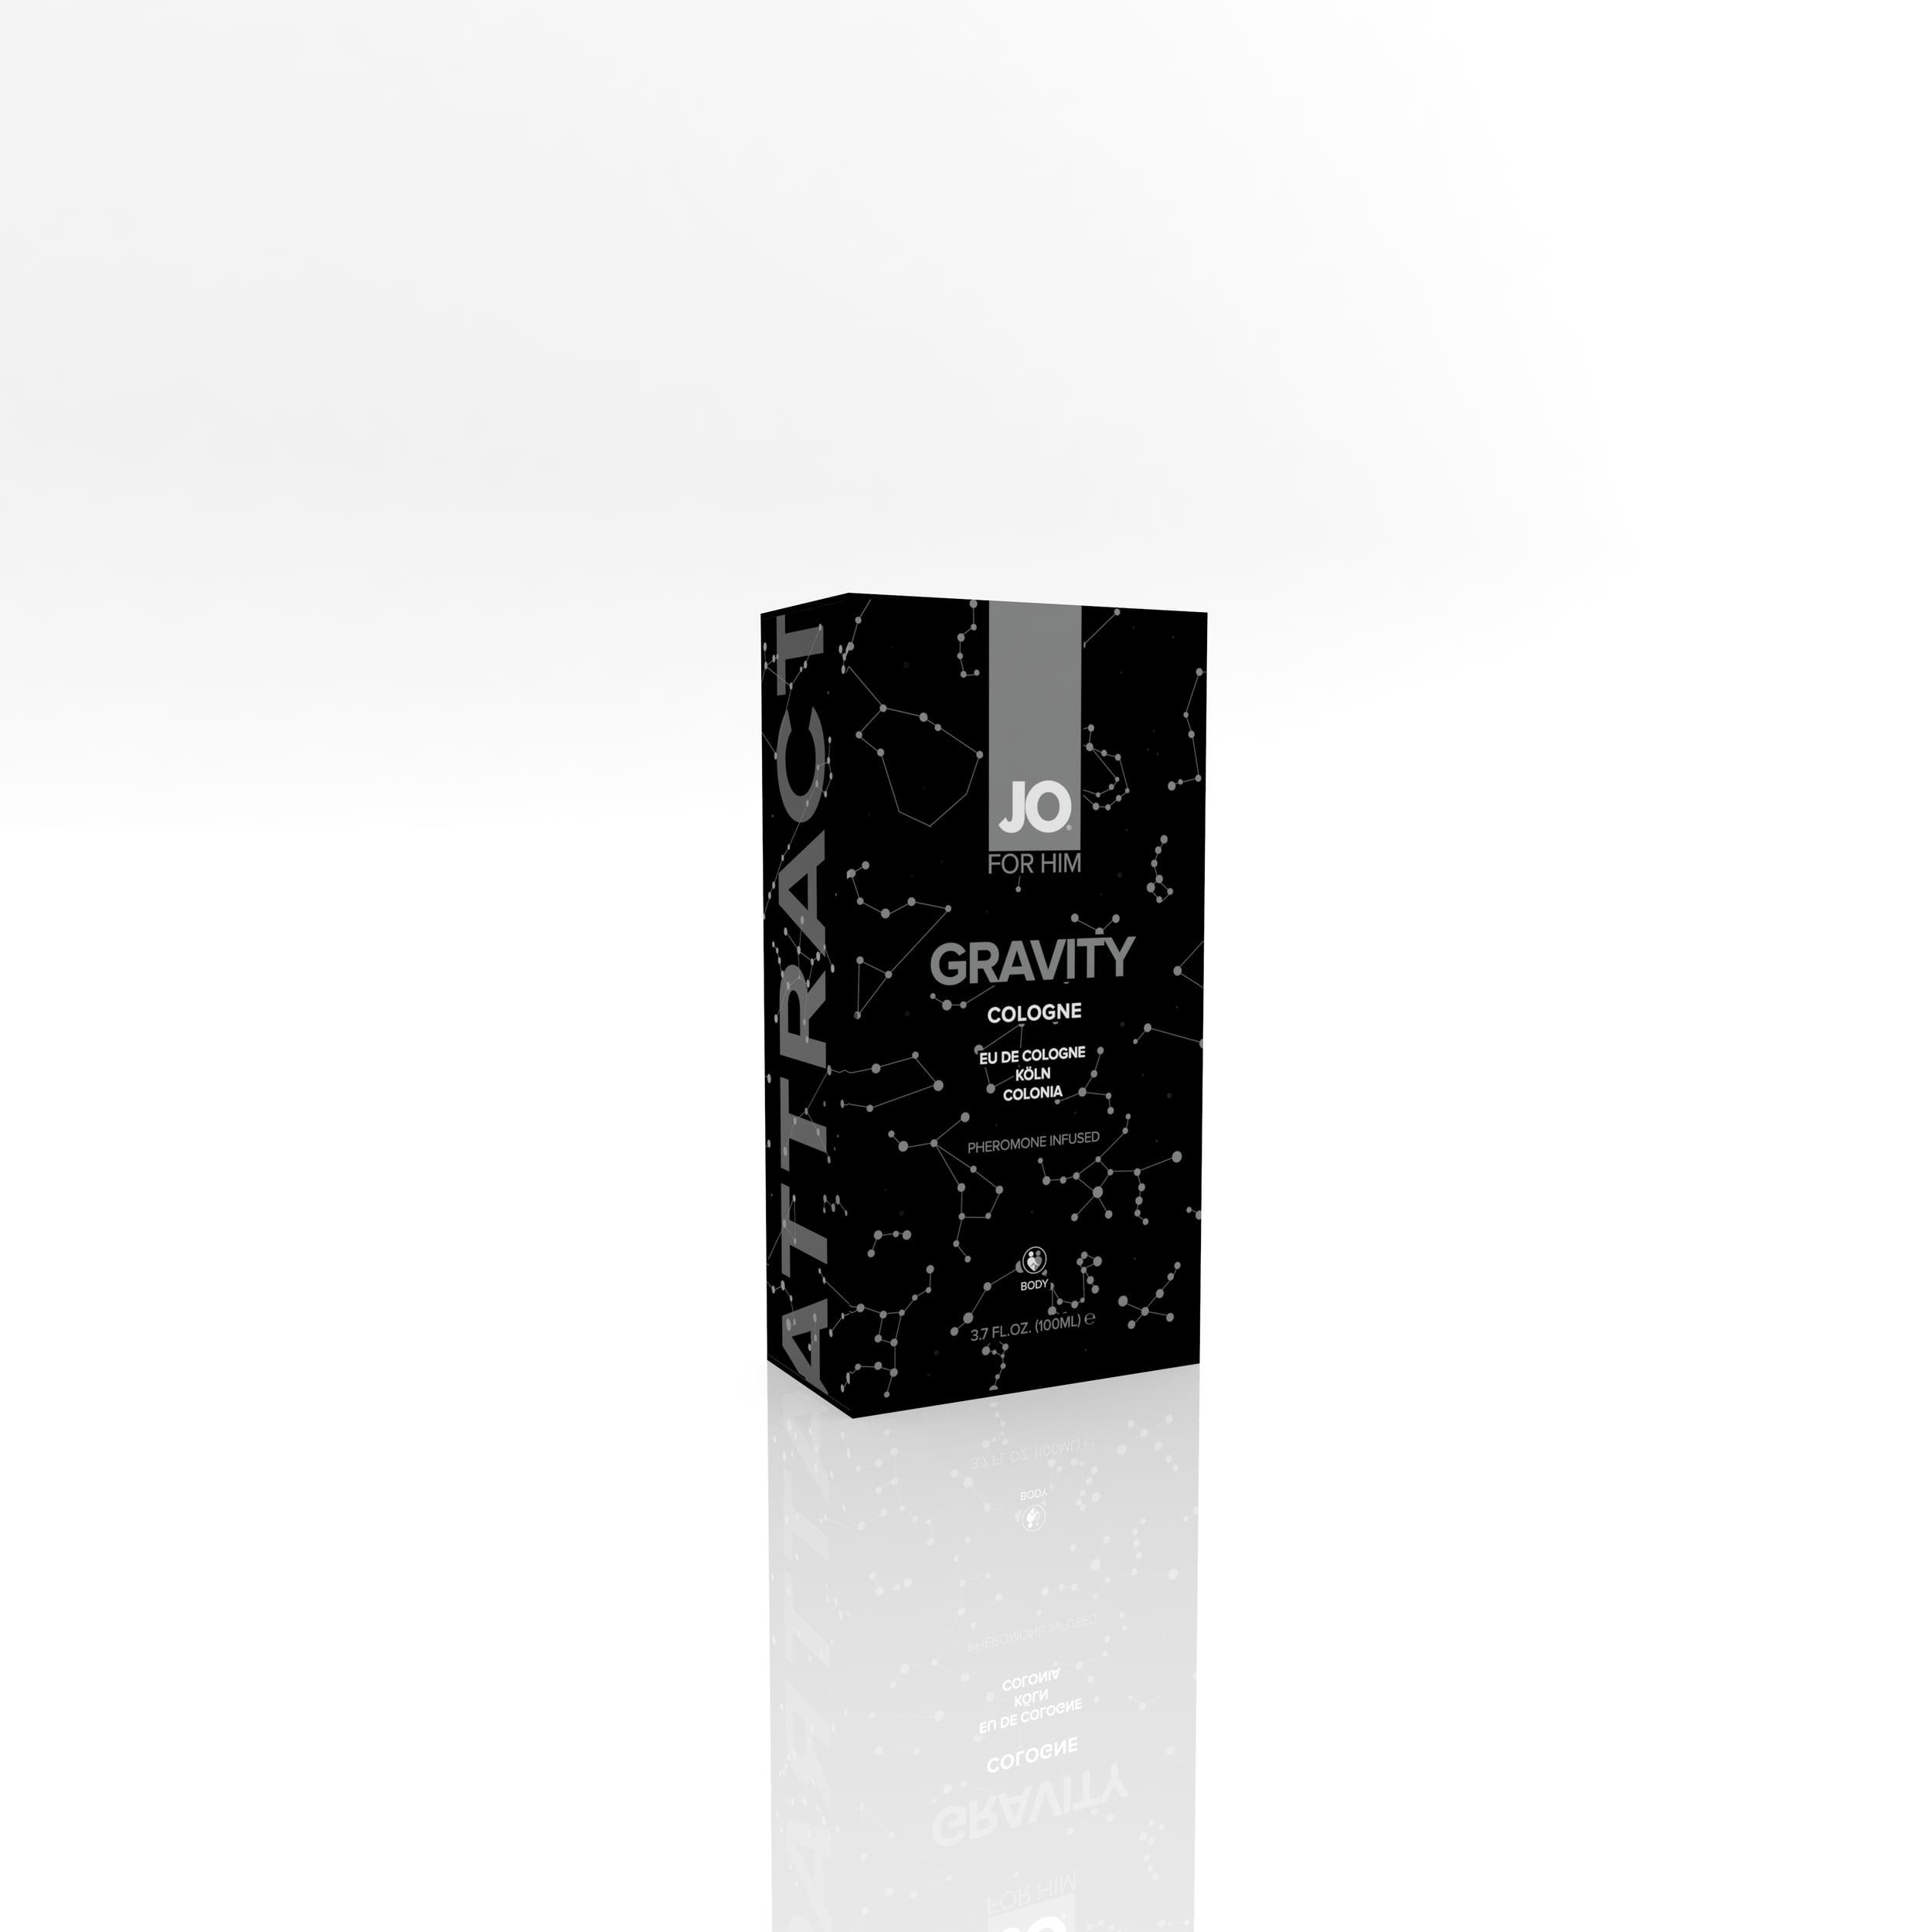 40681 - JO GRAVITY - COLOGNE - INFUSED WITH PHEROMONE - FOR HIM - 3.9fl.oz.jpg